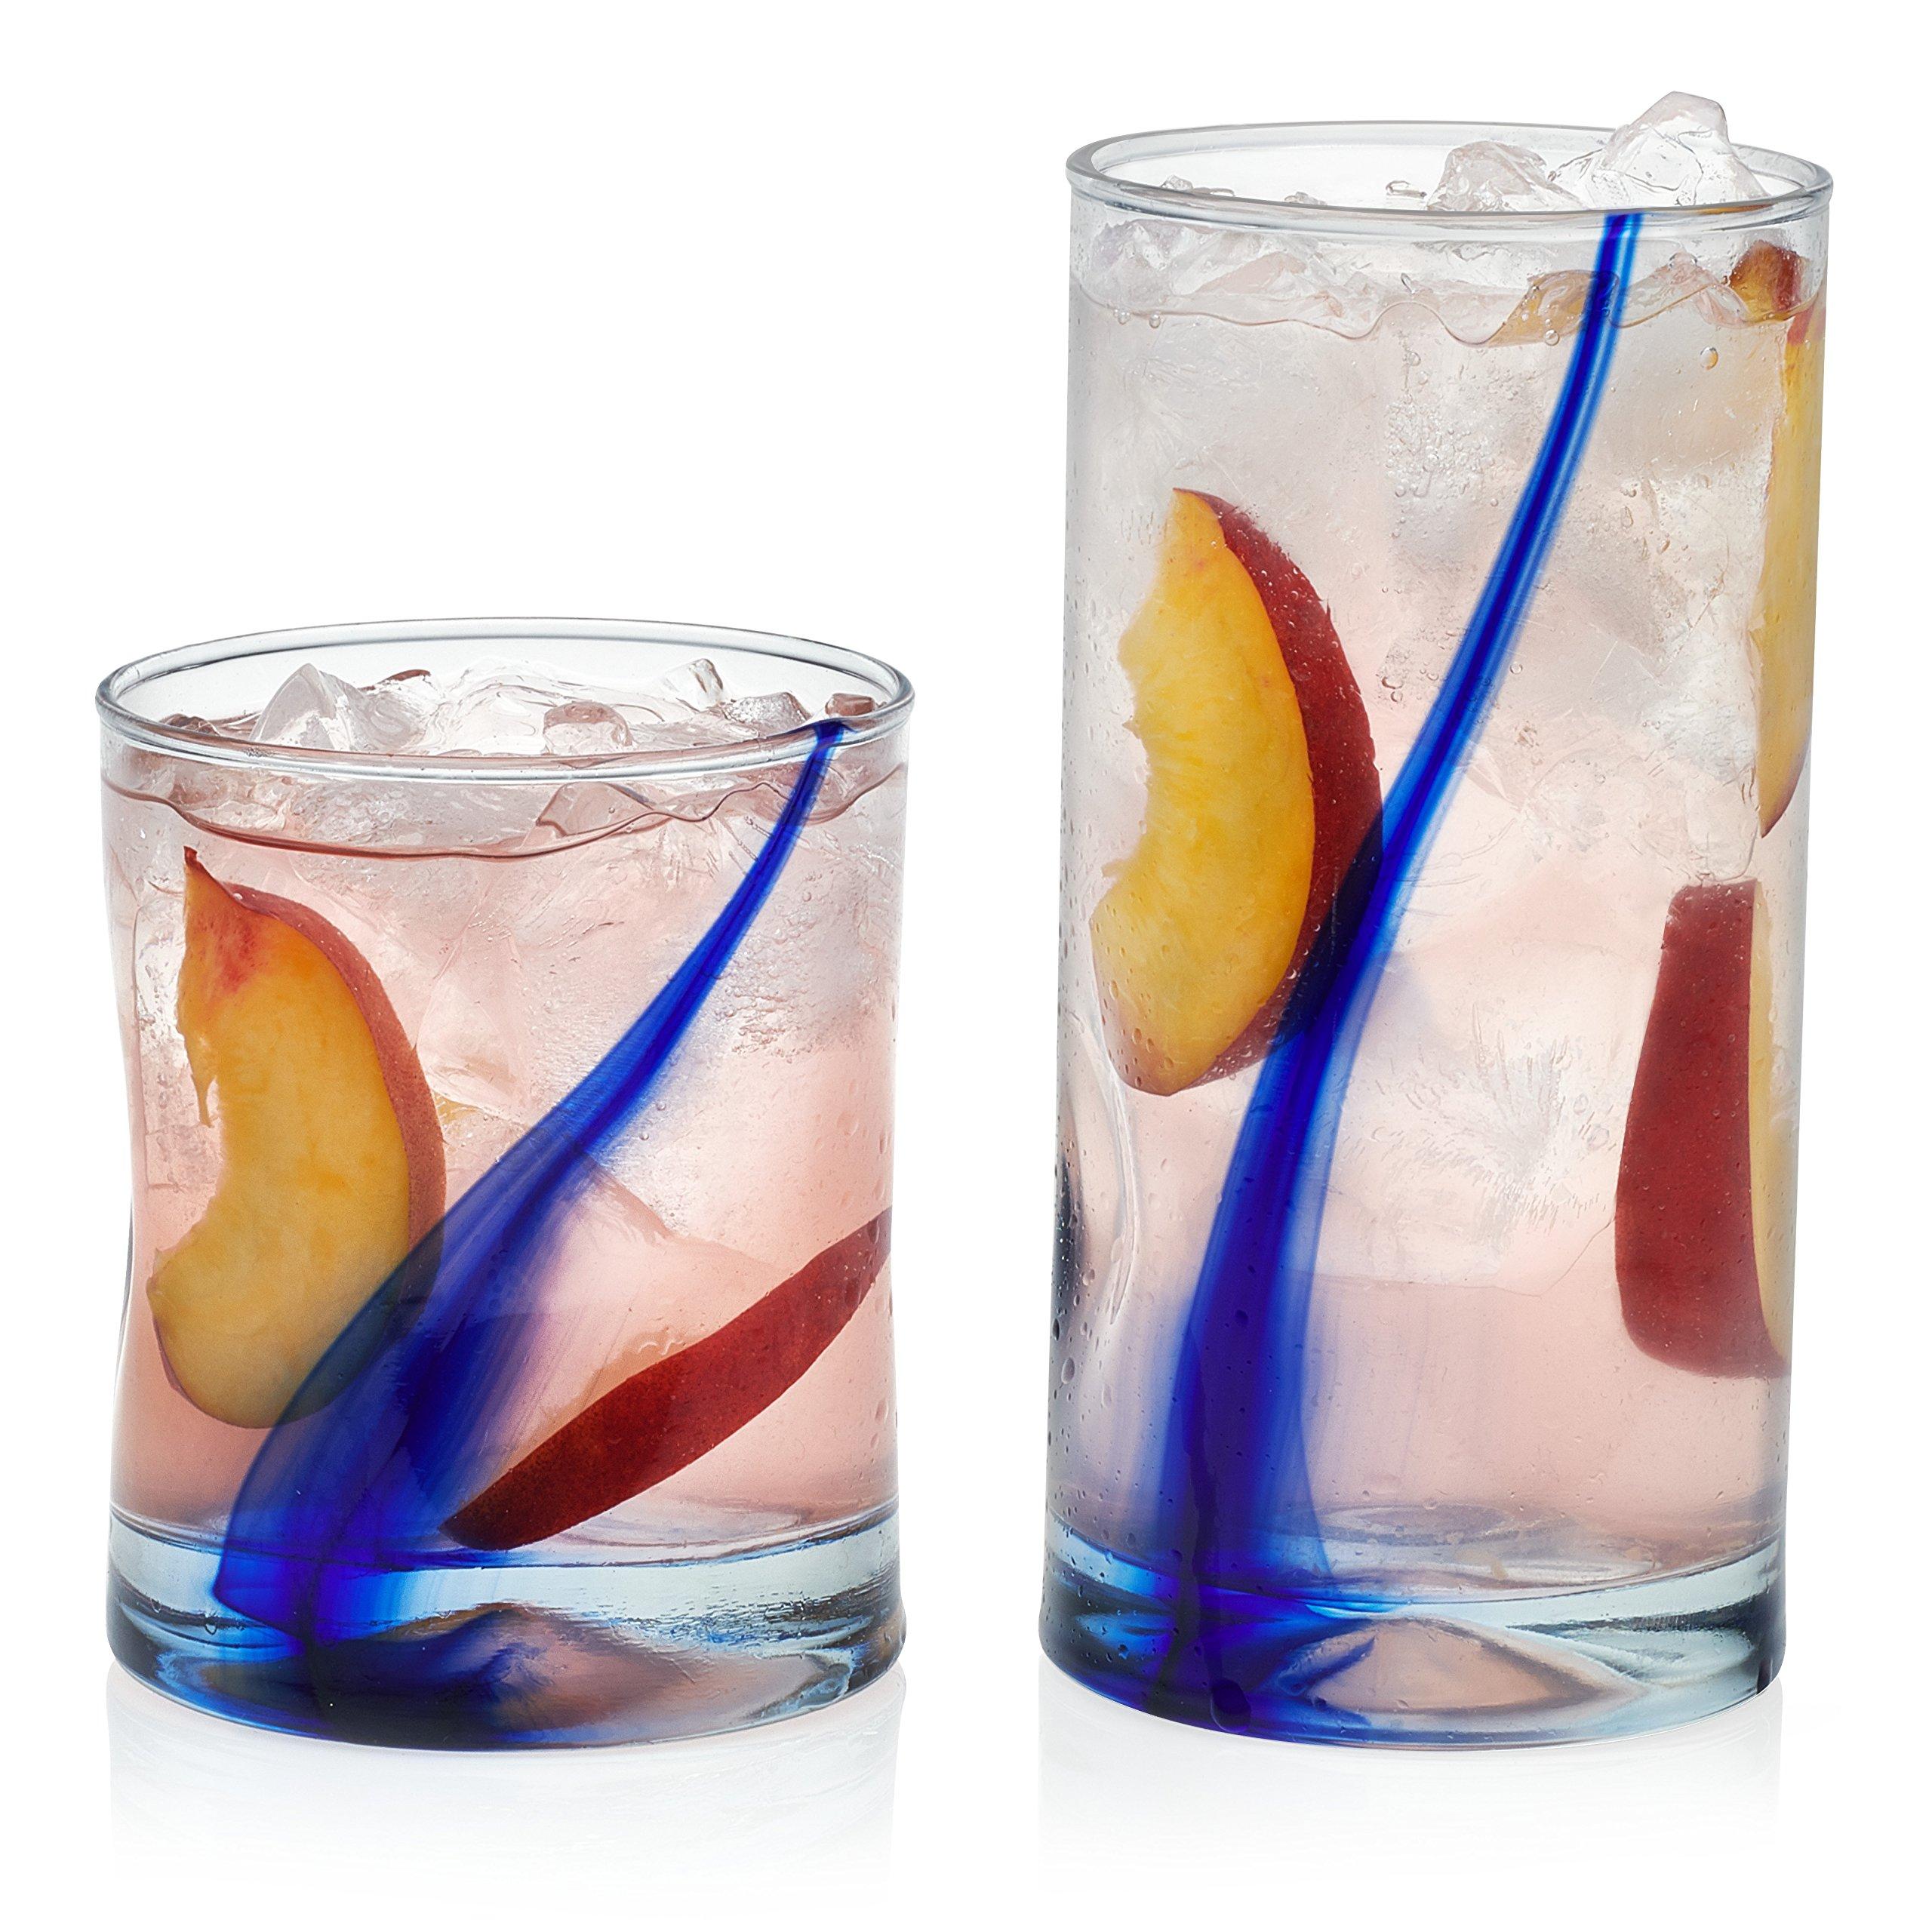 Libbey Blue Ribbon Impressions 16-piece Glass Drinkware Set